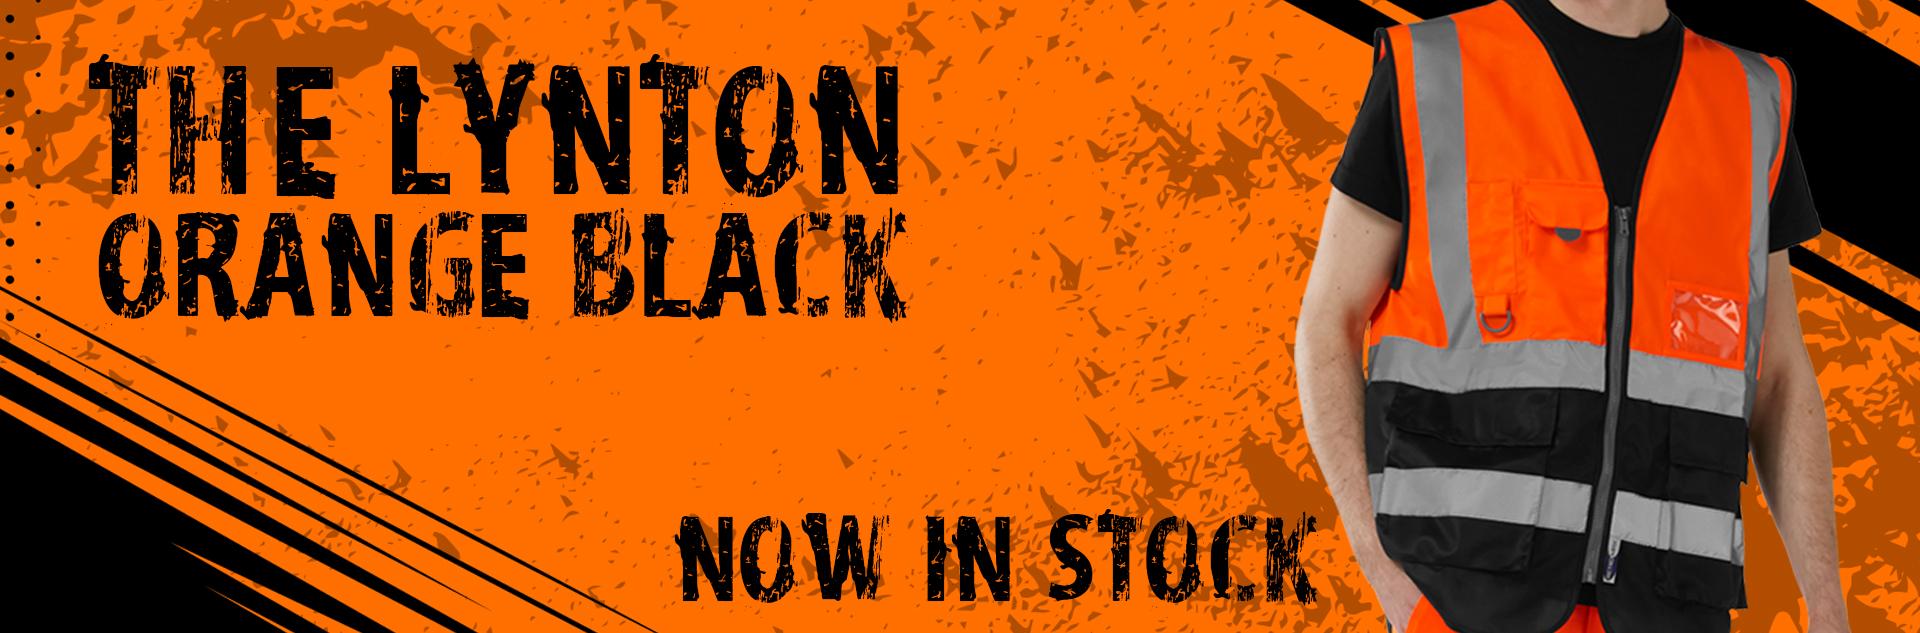 W11 Orange Black